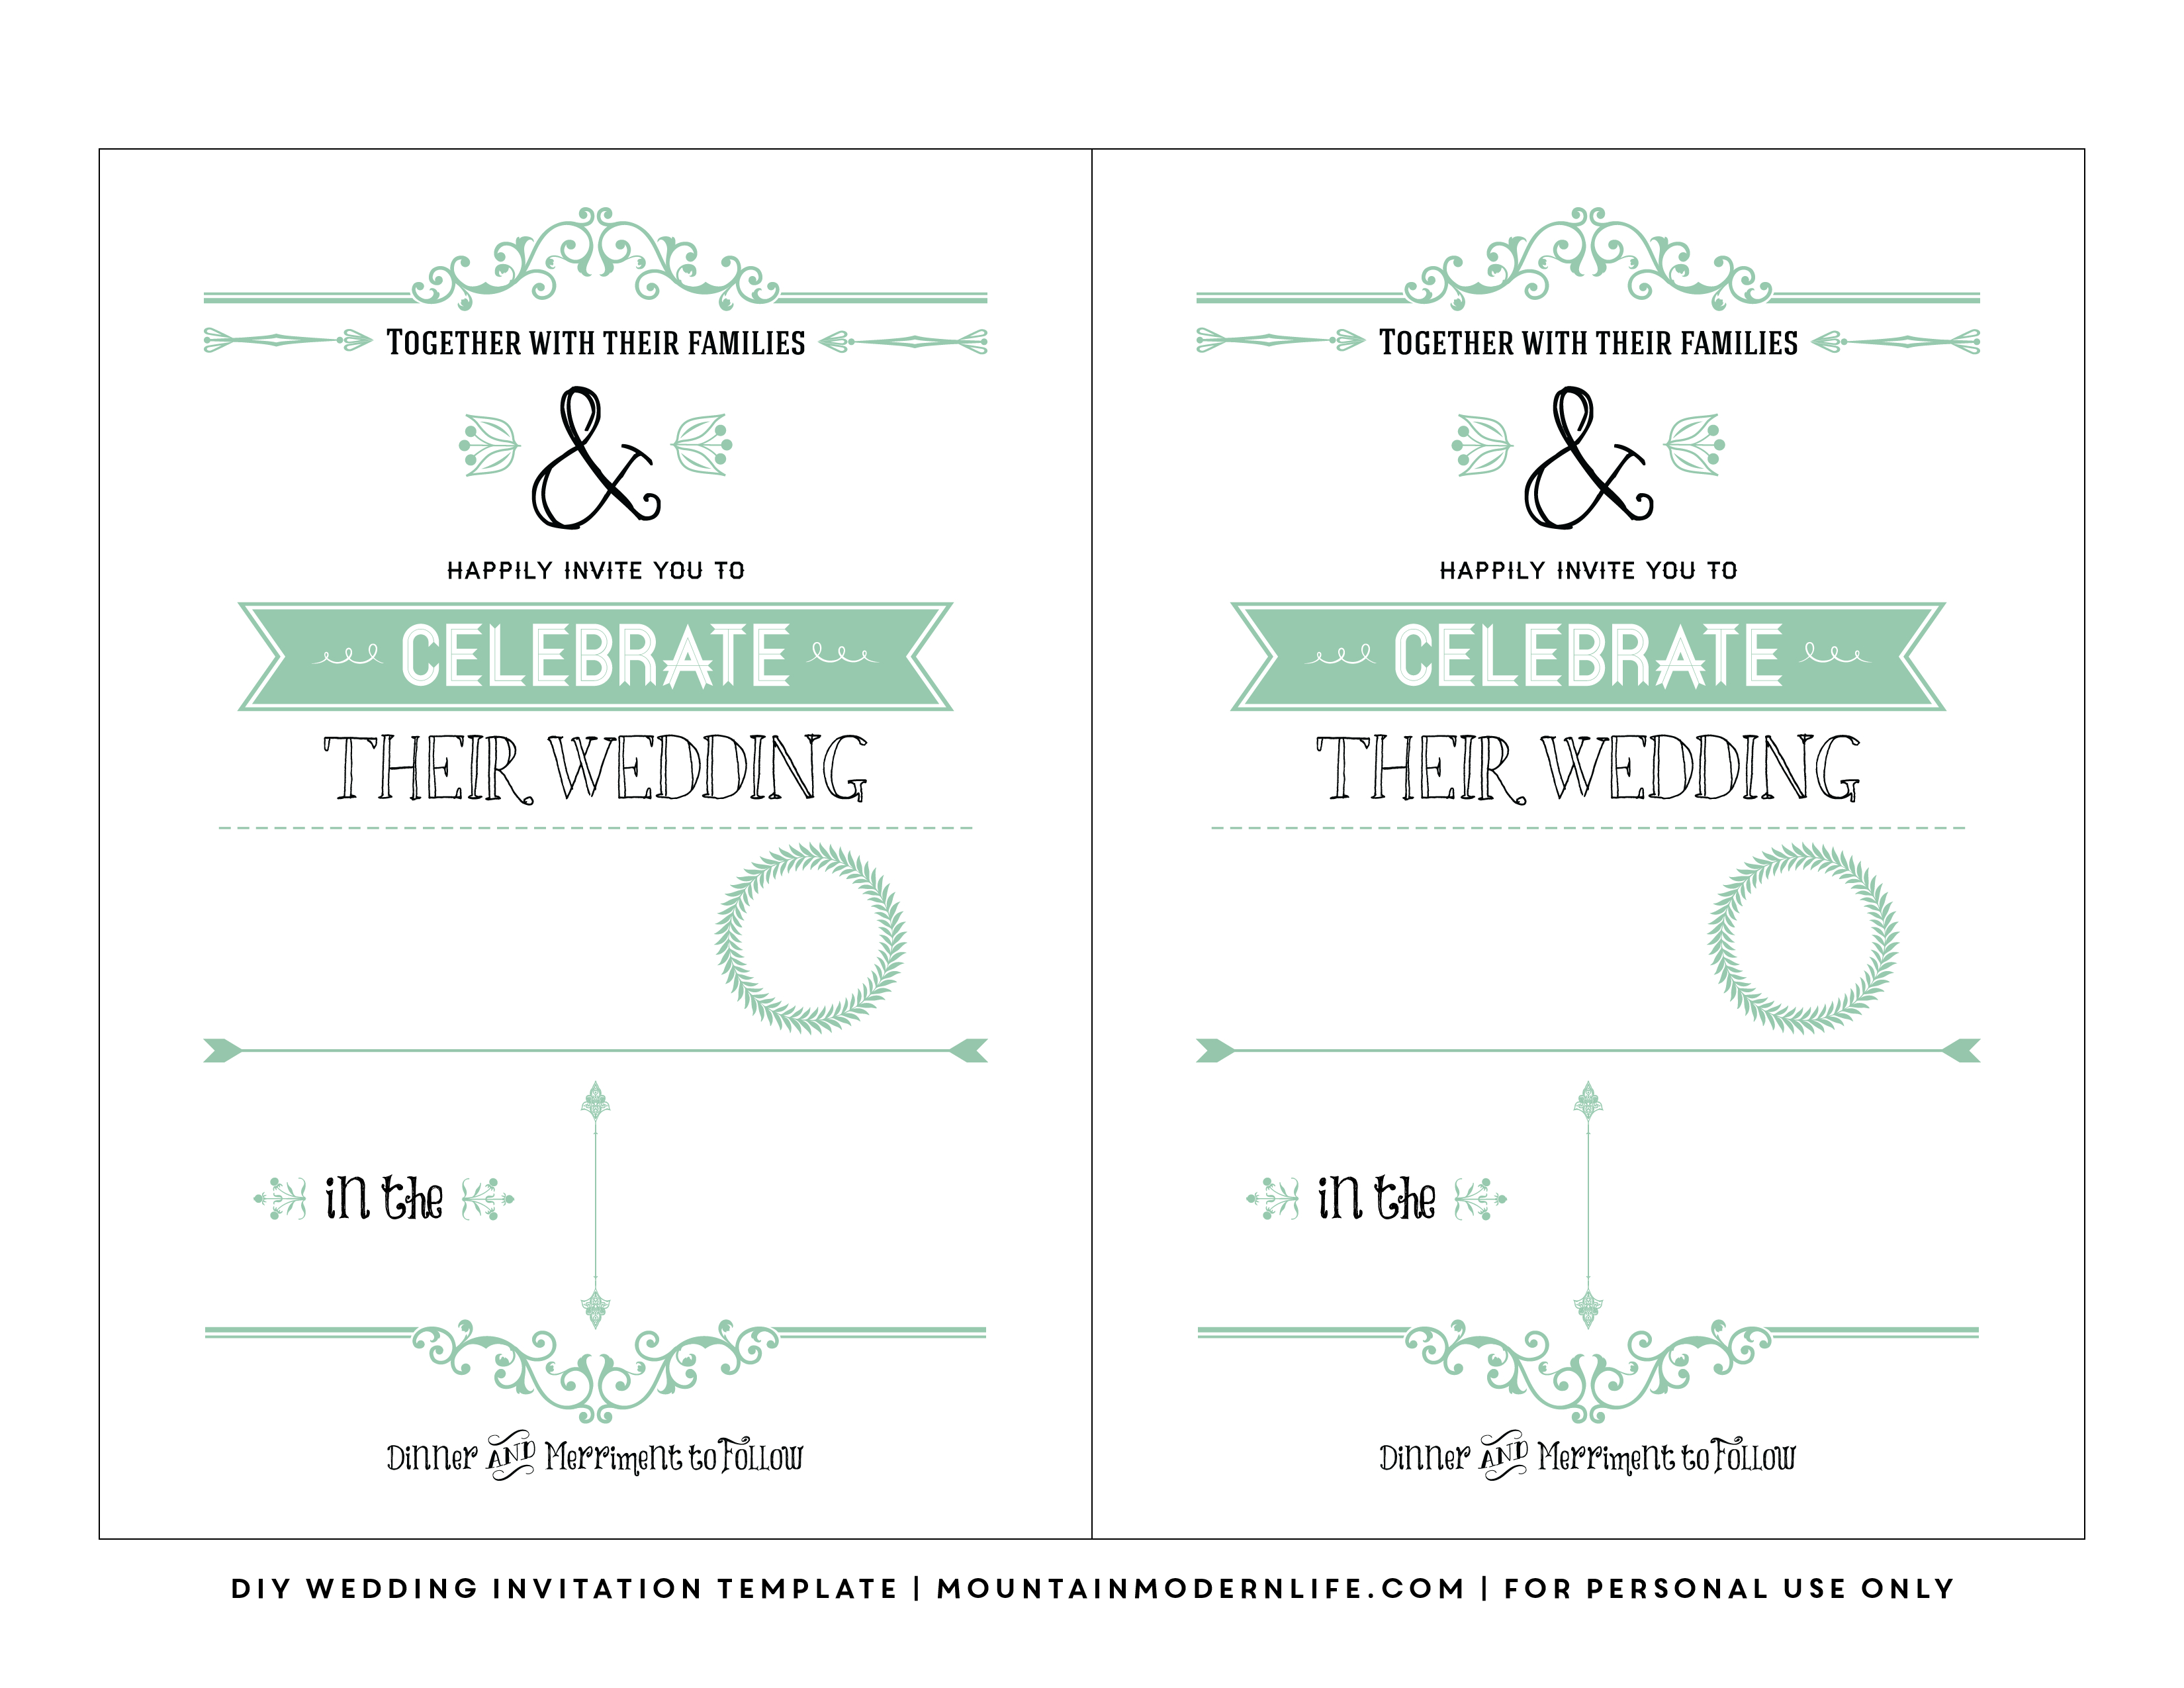 Free Wedding Invitation Template | Mountainmodernlife - Free Printable Invitations Templates